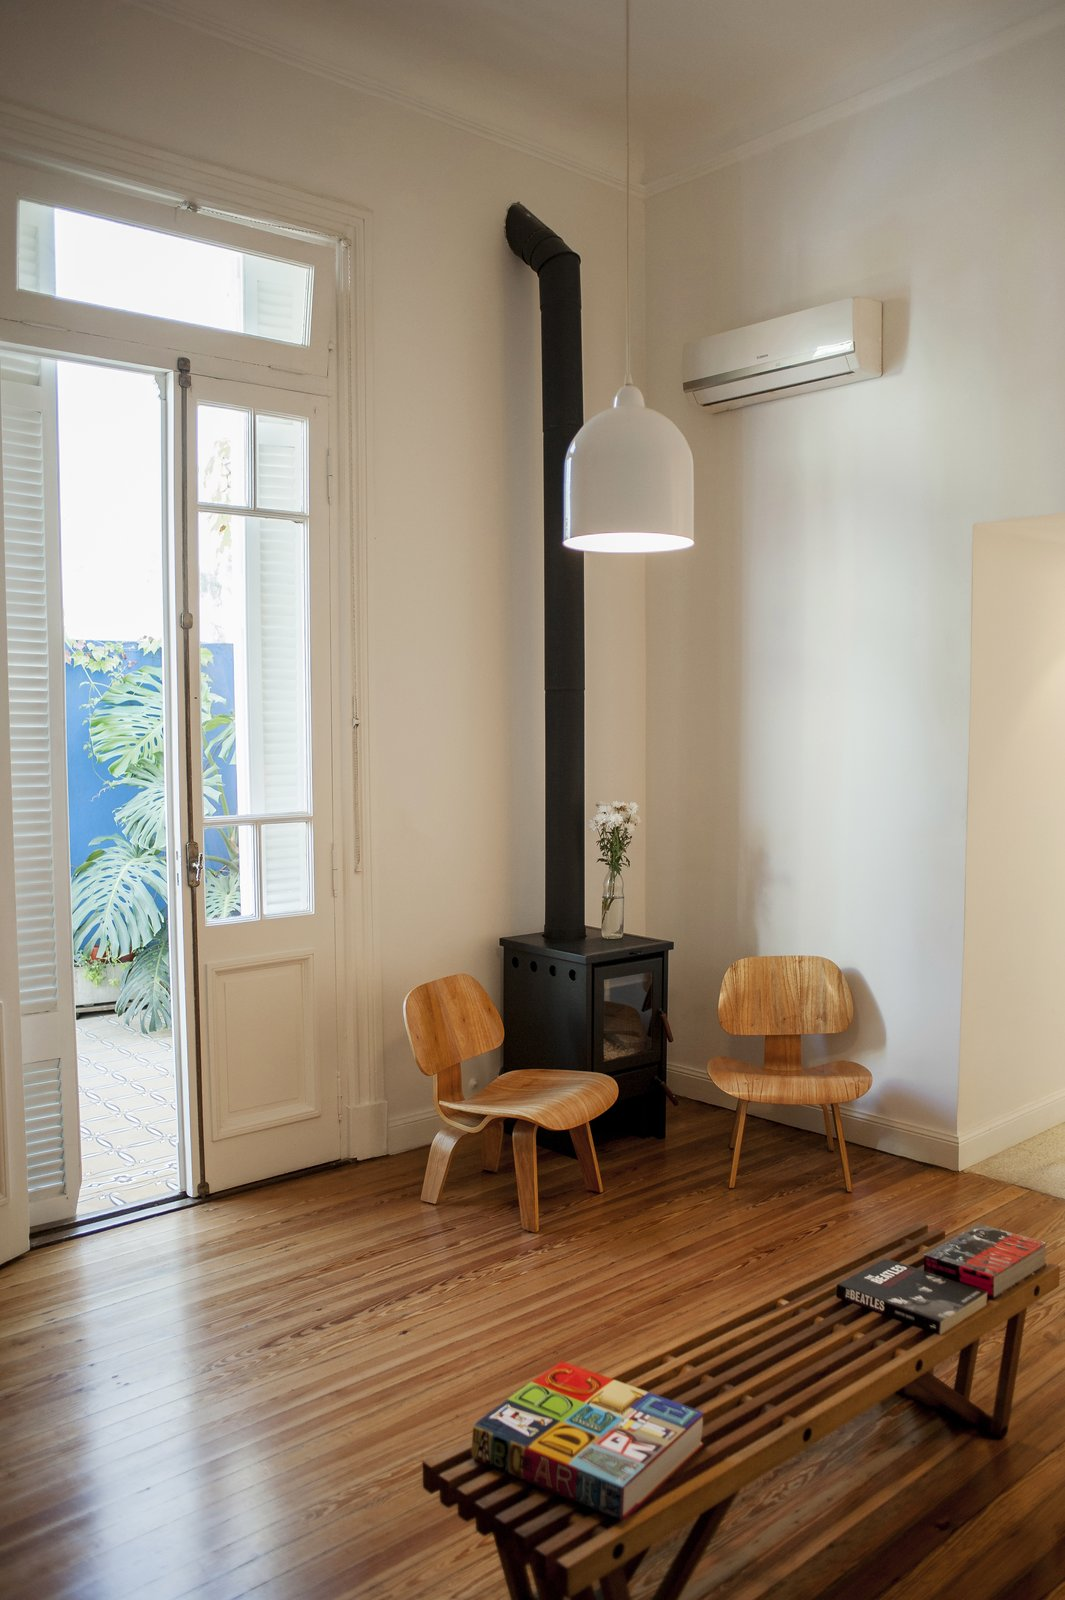 The living room preserves the original wooden floors and entrances  Artigas